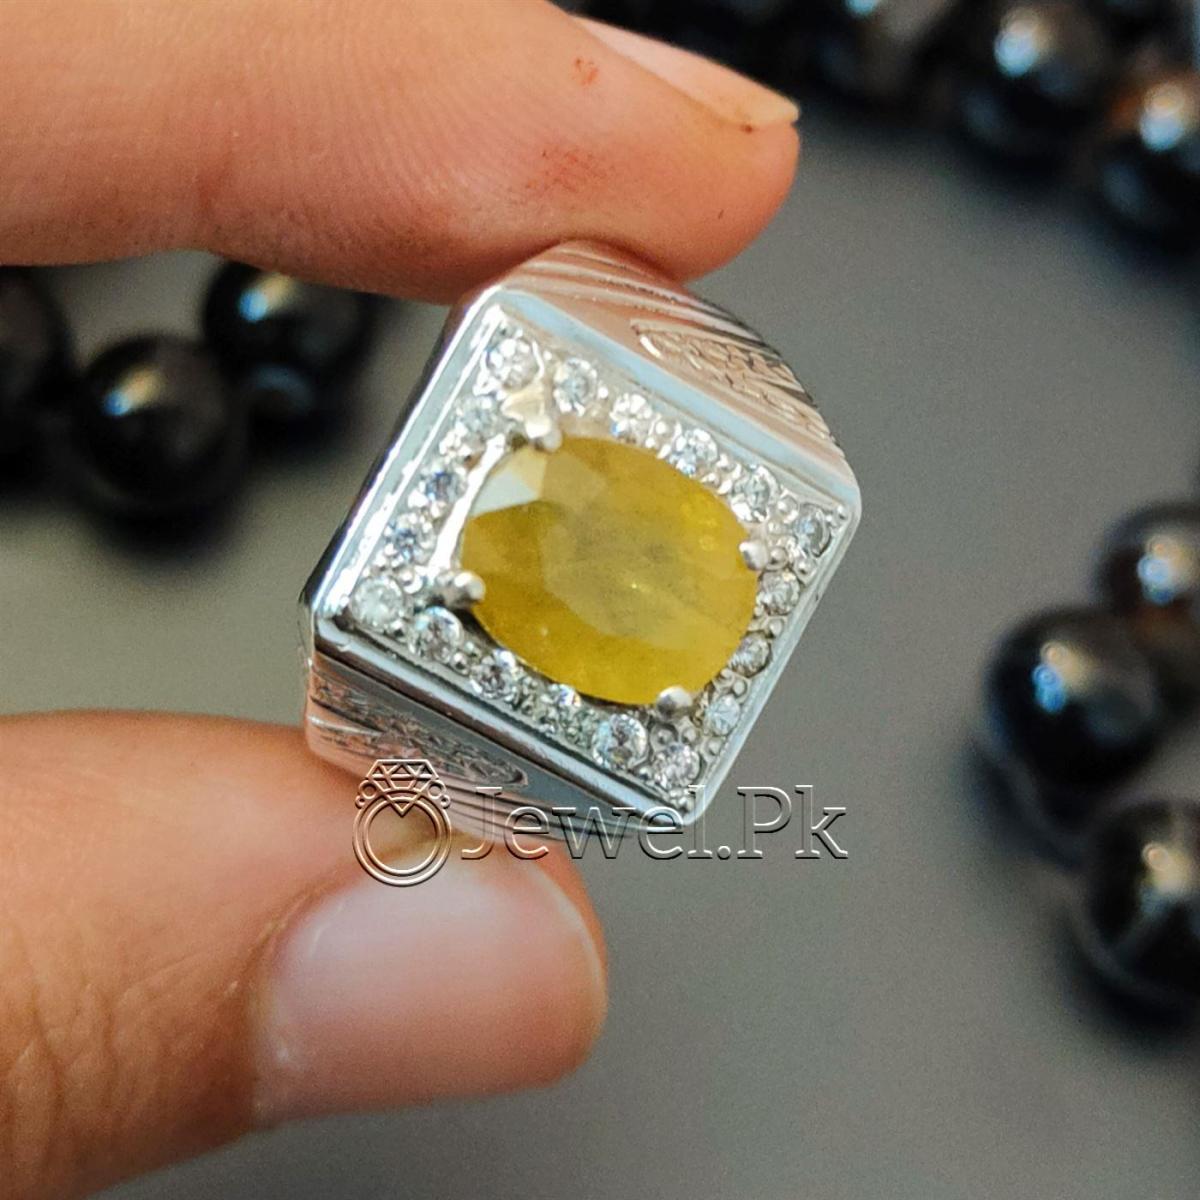 Yellow Sapphire Pukhraj Ring Handmade Silver 925 Chandi 10 natural gemstones pakistan + 925 silver jewelry online